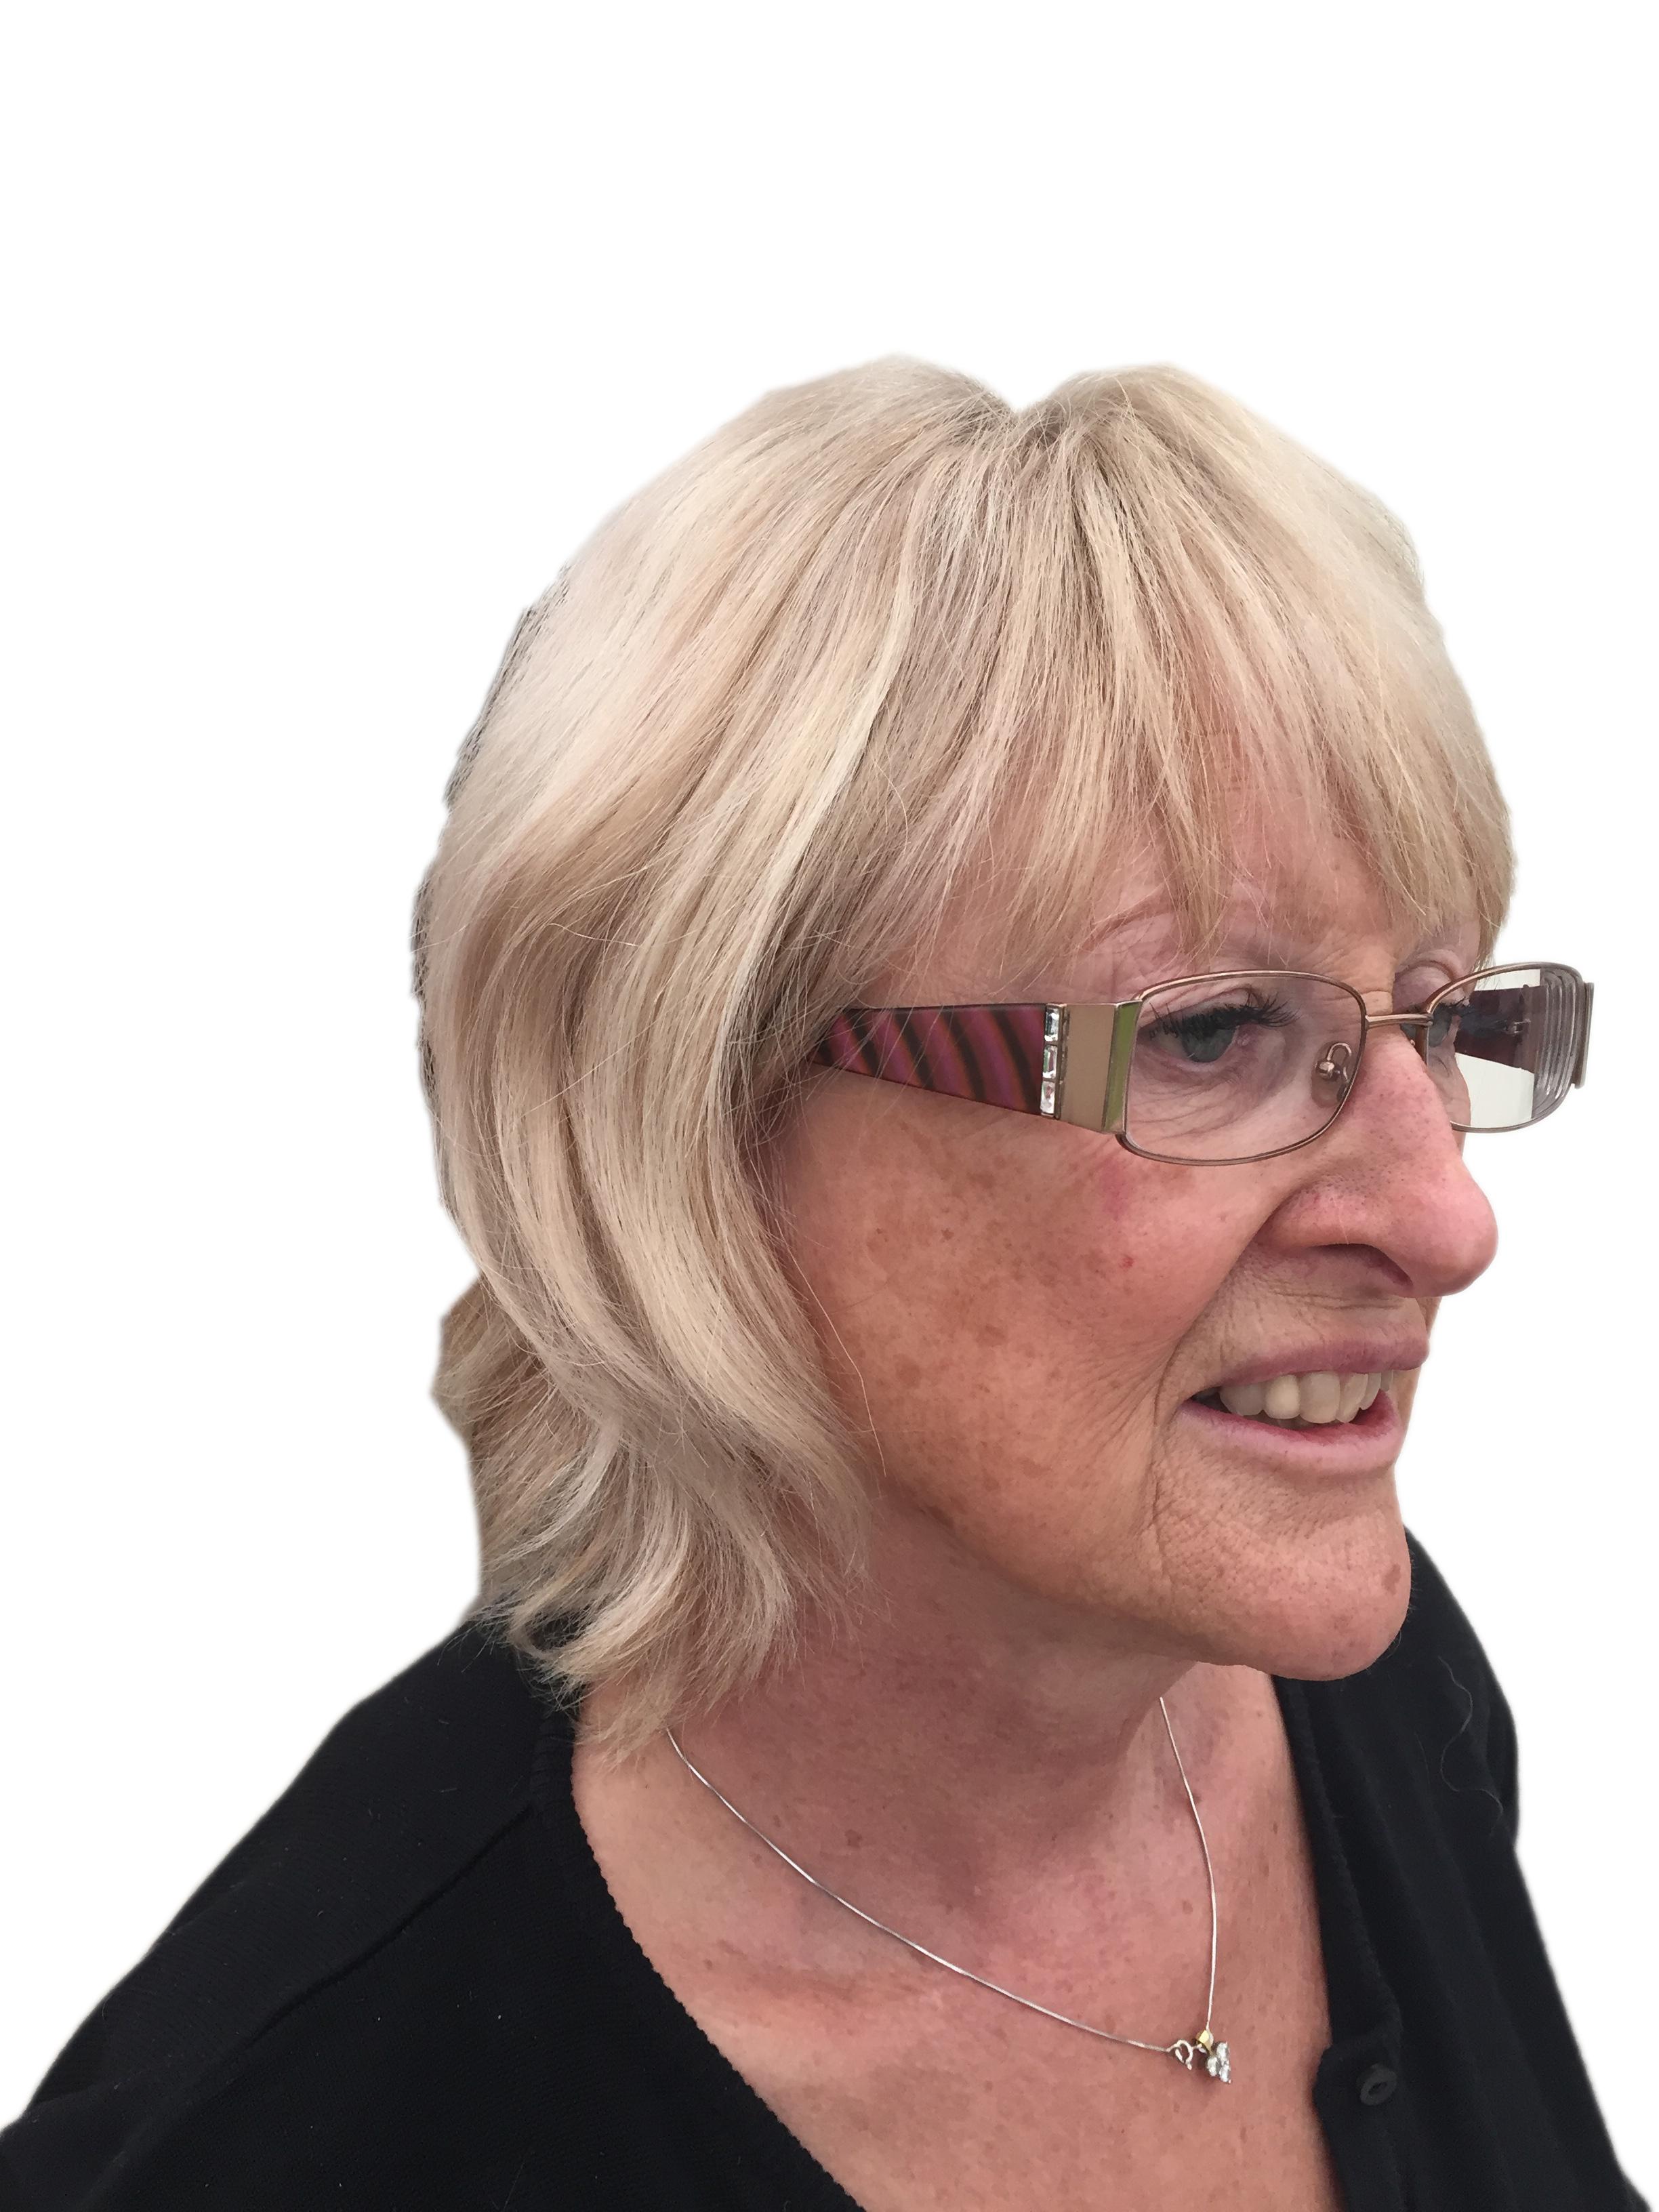 closure for short thin hair women uk